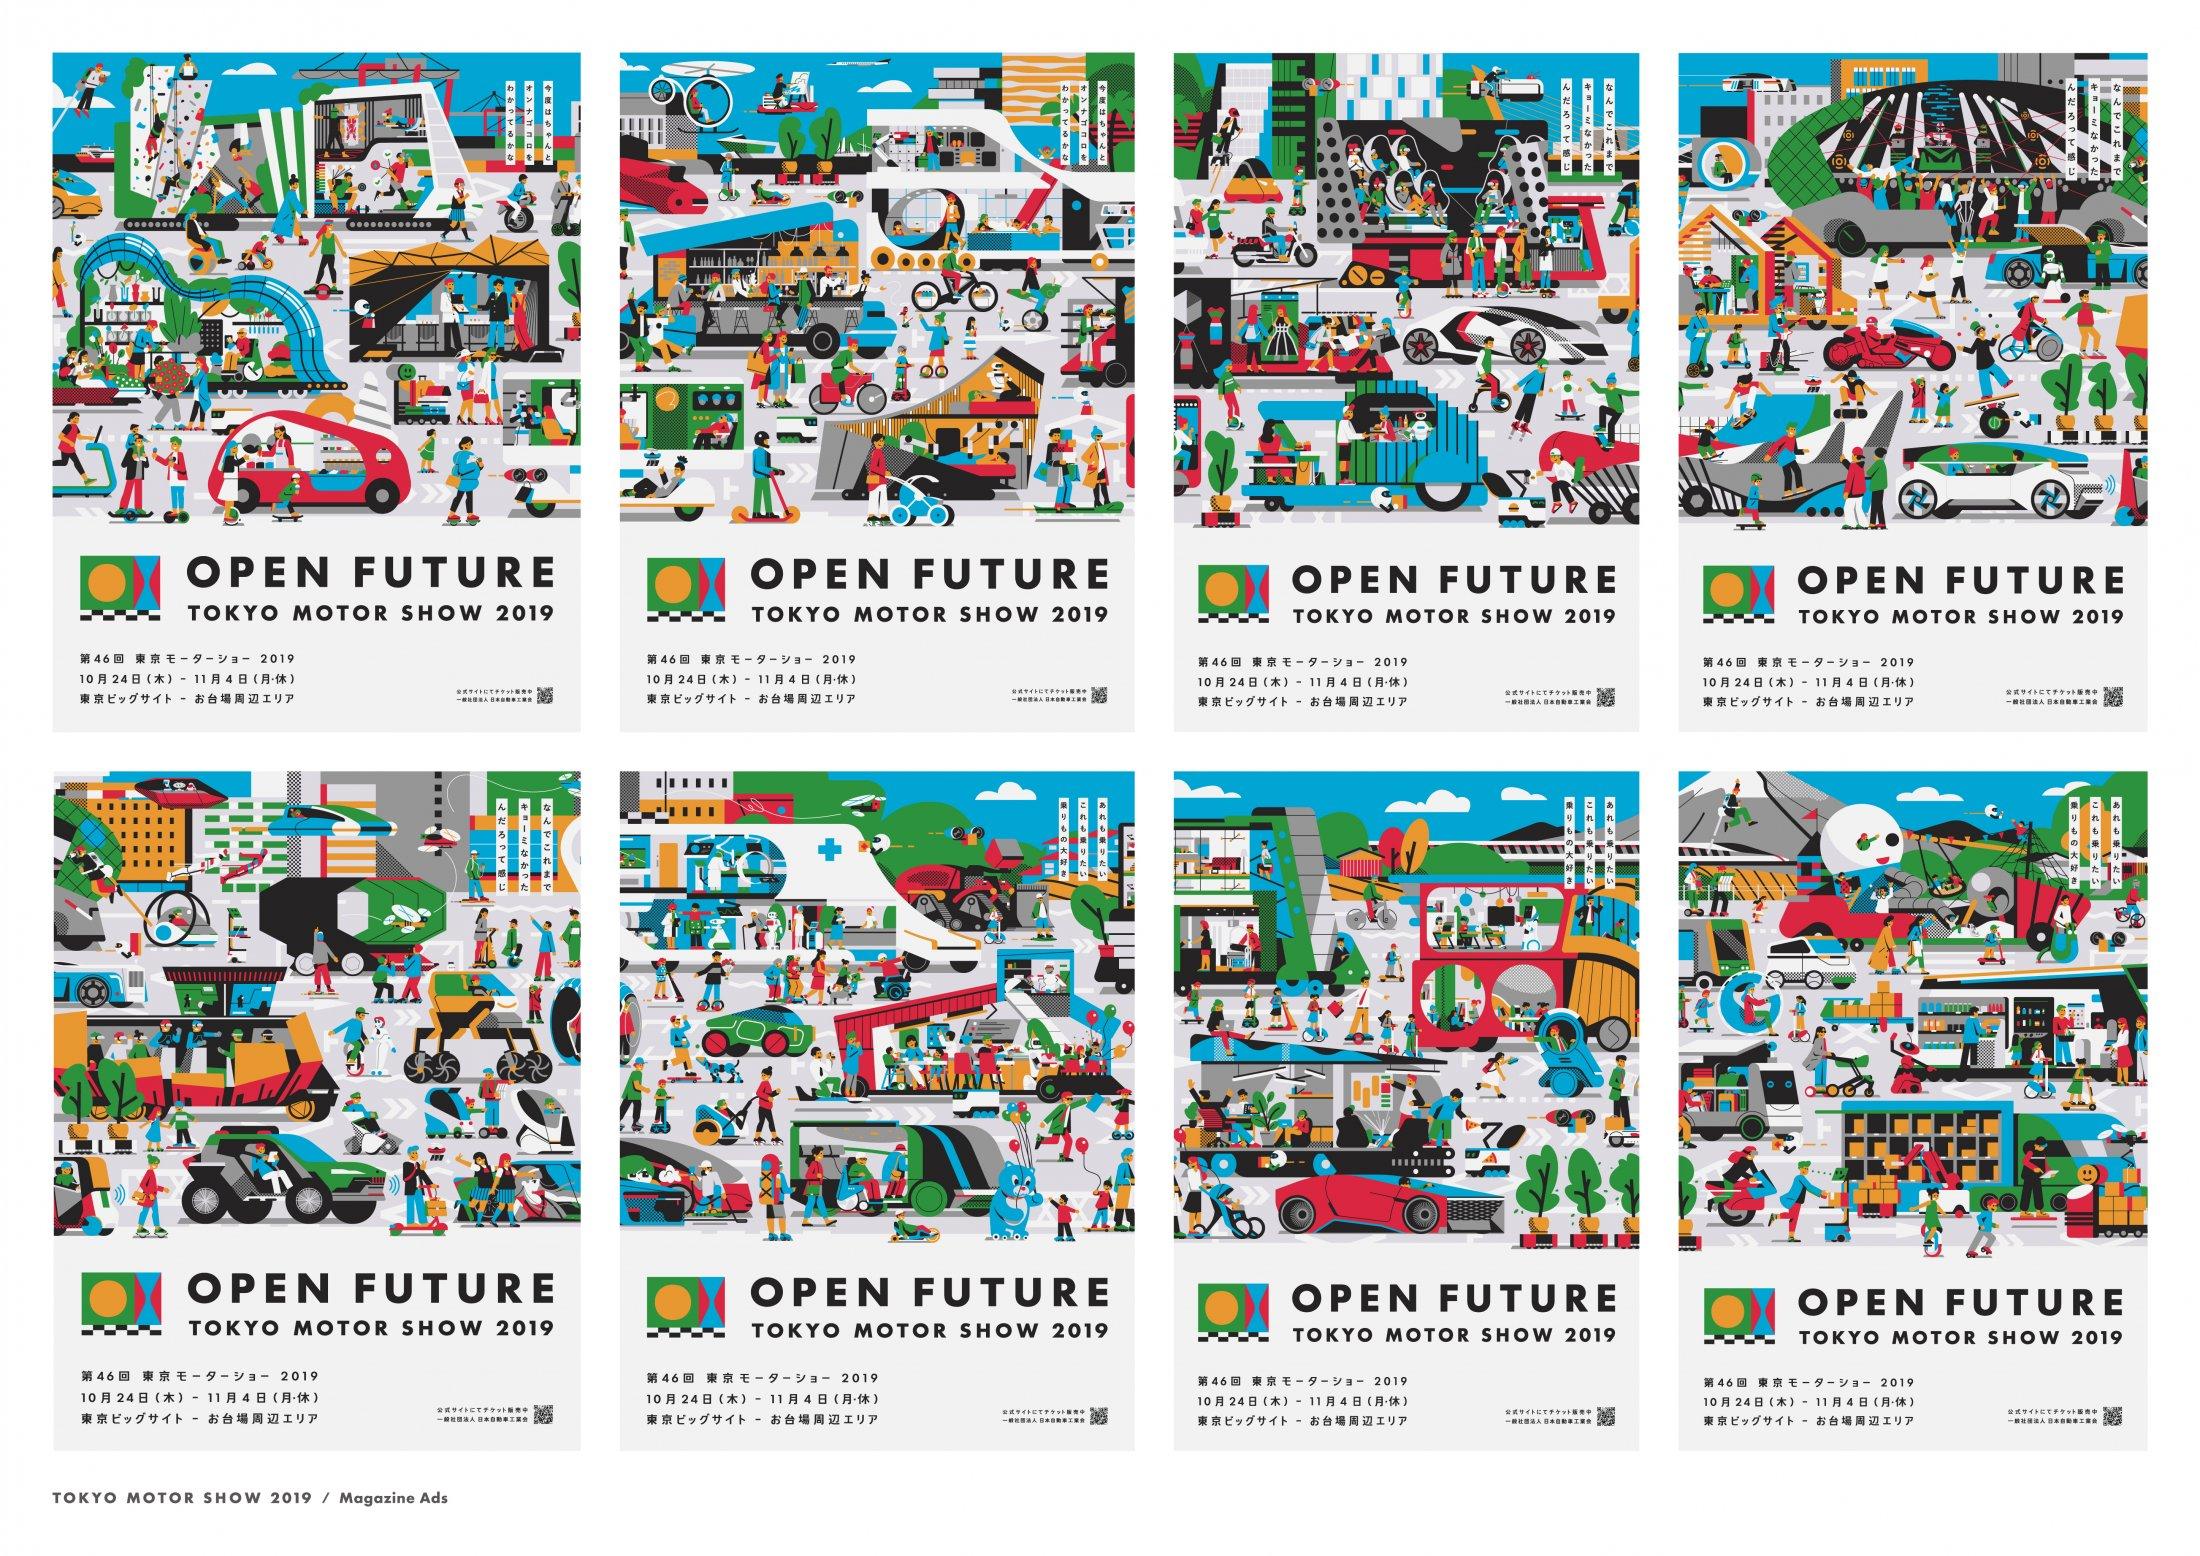 Thumbnail for TOKYO MOTOR SHOW 2019